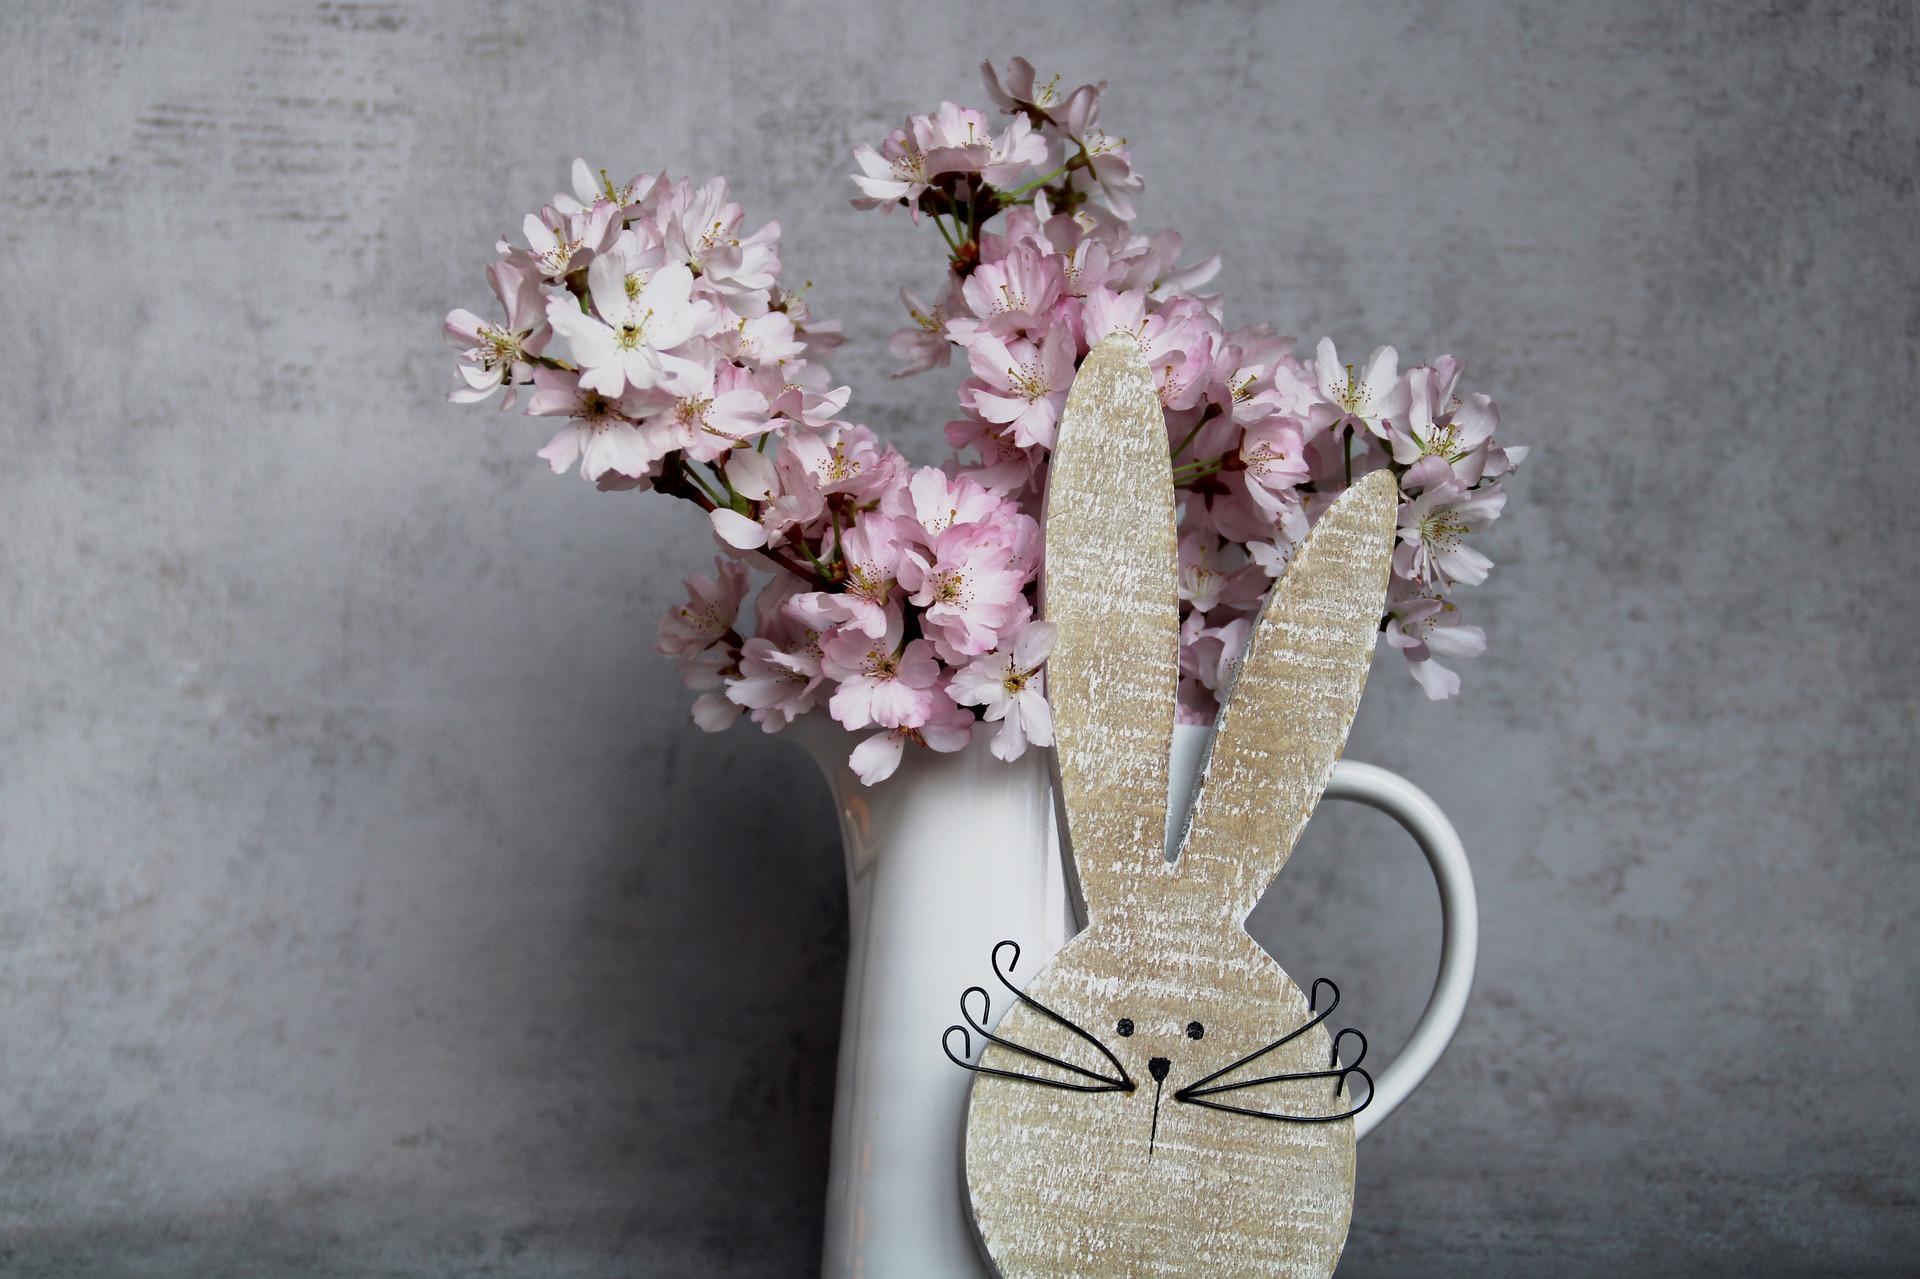 Buona Pasqua frasi